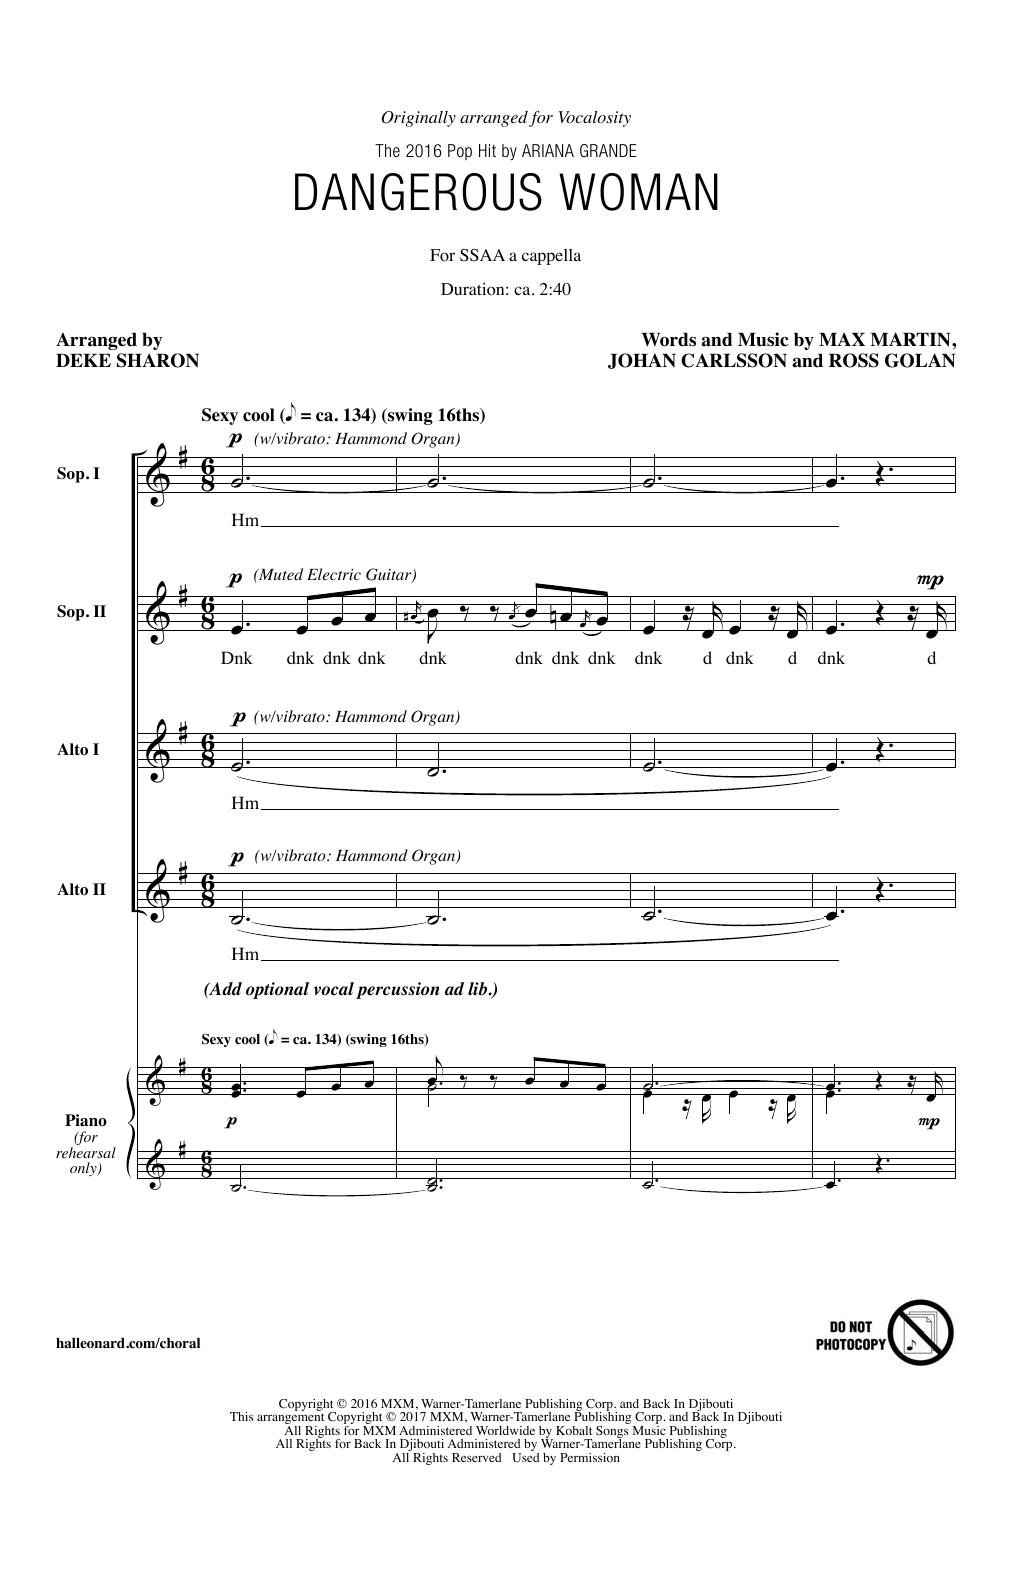 Ariana Grande Dangerous Woman (arr. Deke Sharon) sheet music notes and chords. Download Printable PDF.